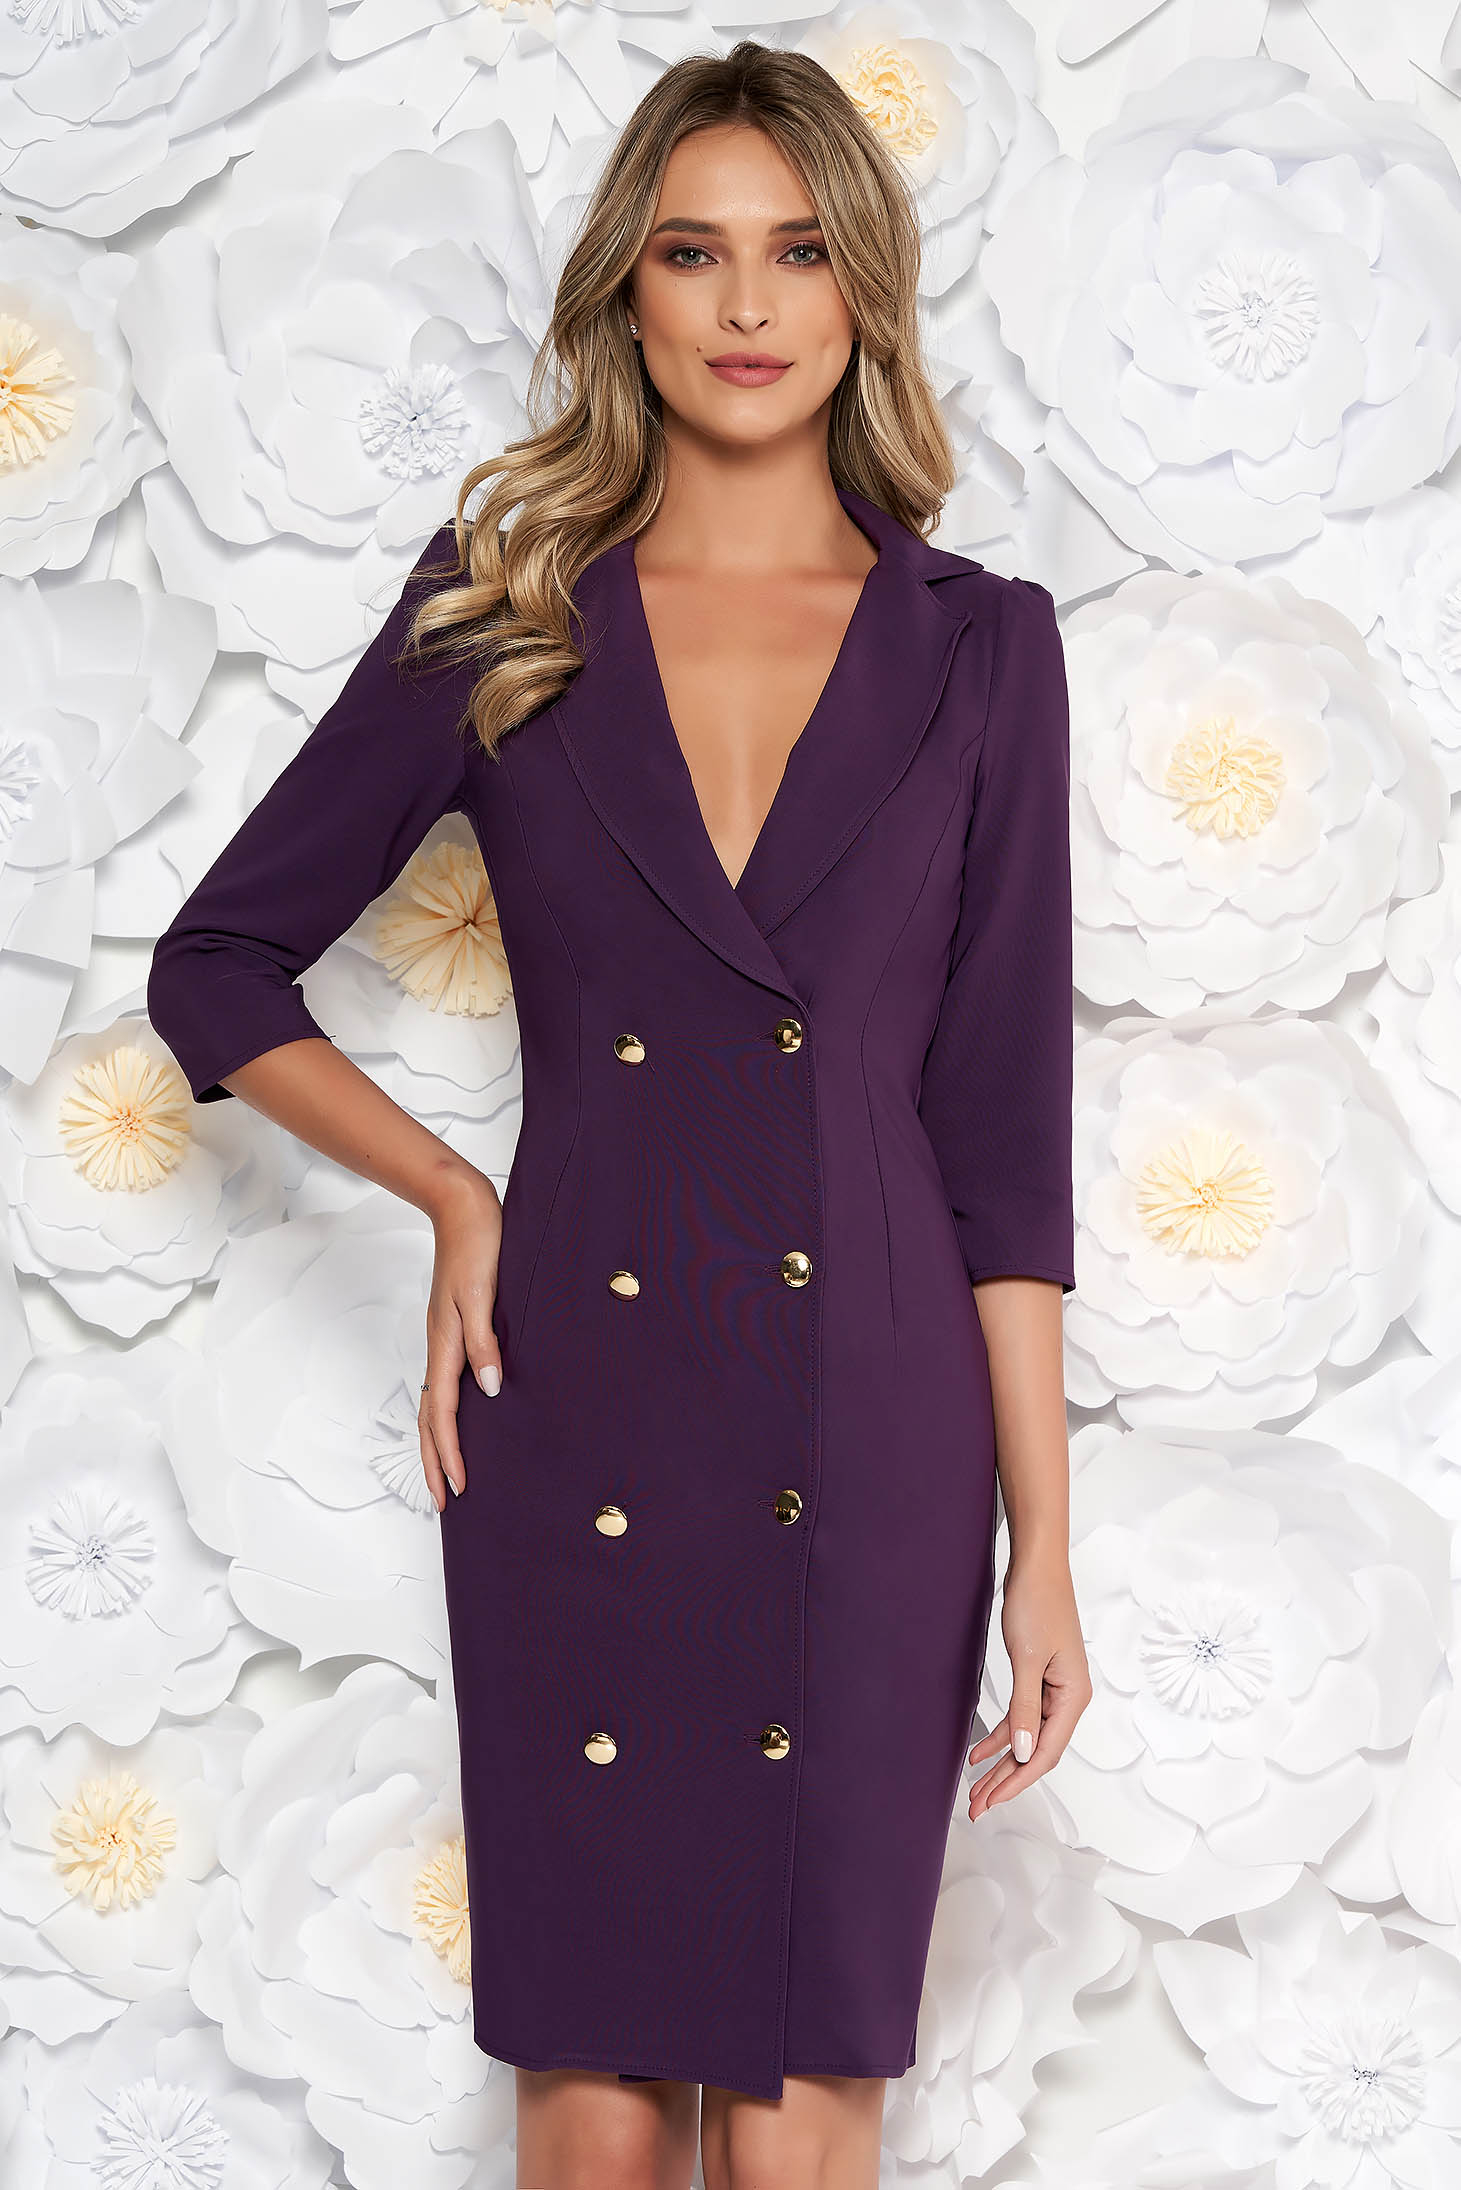 Artista purple elegant blazer type dress slightly elastic fabric wrap around with button accessories